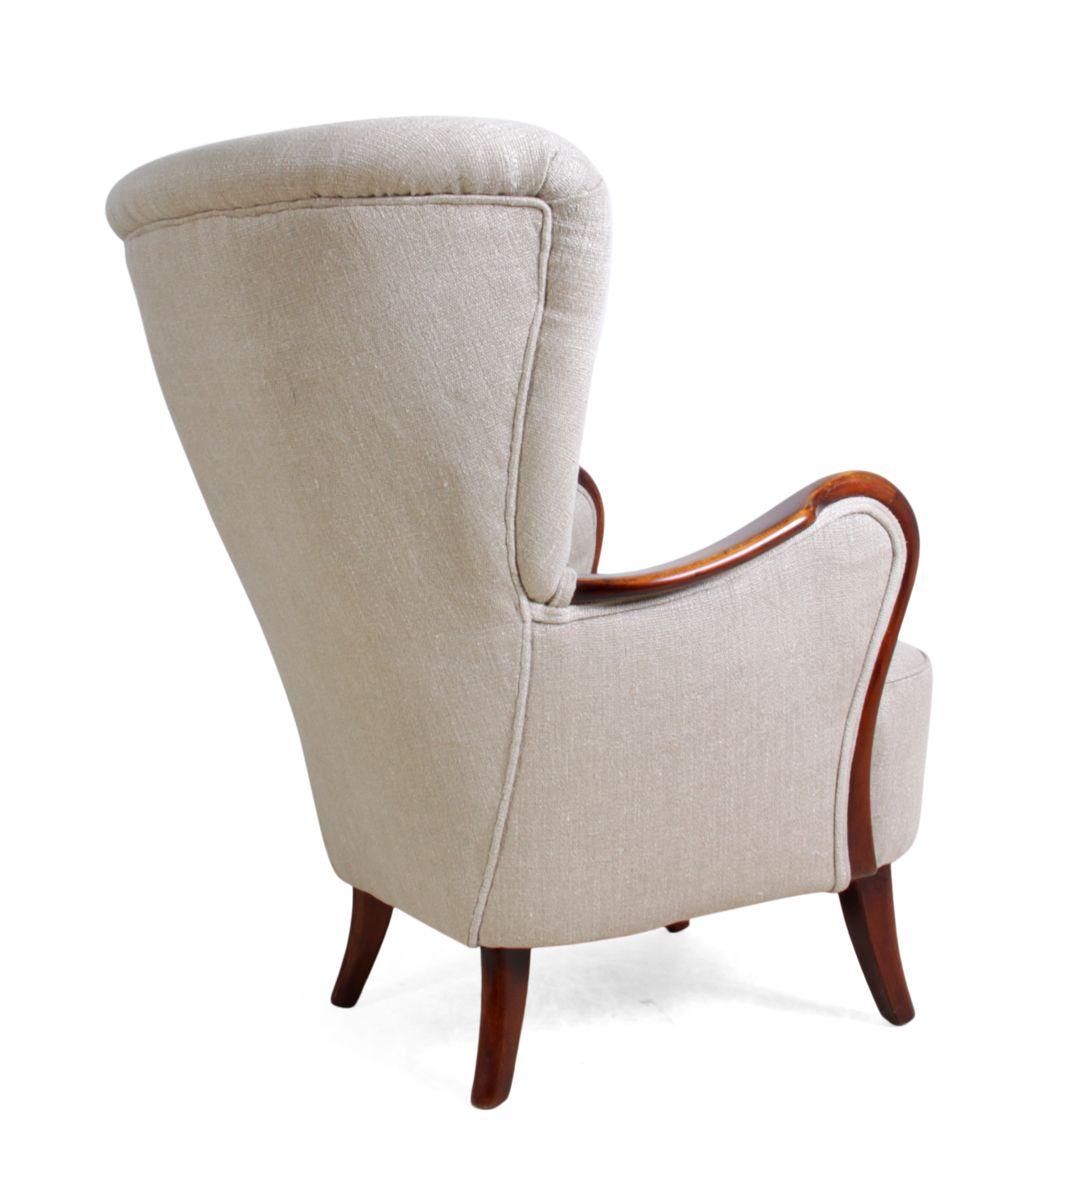 d nischer sessel 1940er bei pamono kaufen. Black Bedroom Furniture Sets. Home Design Ideas